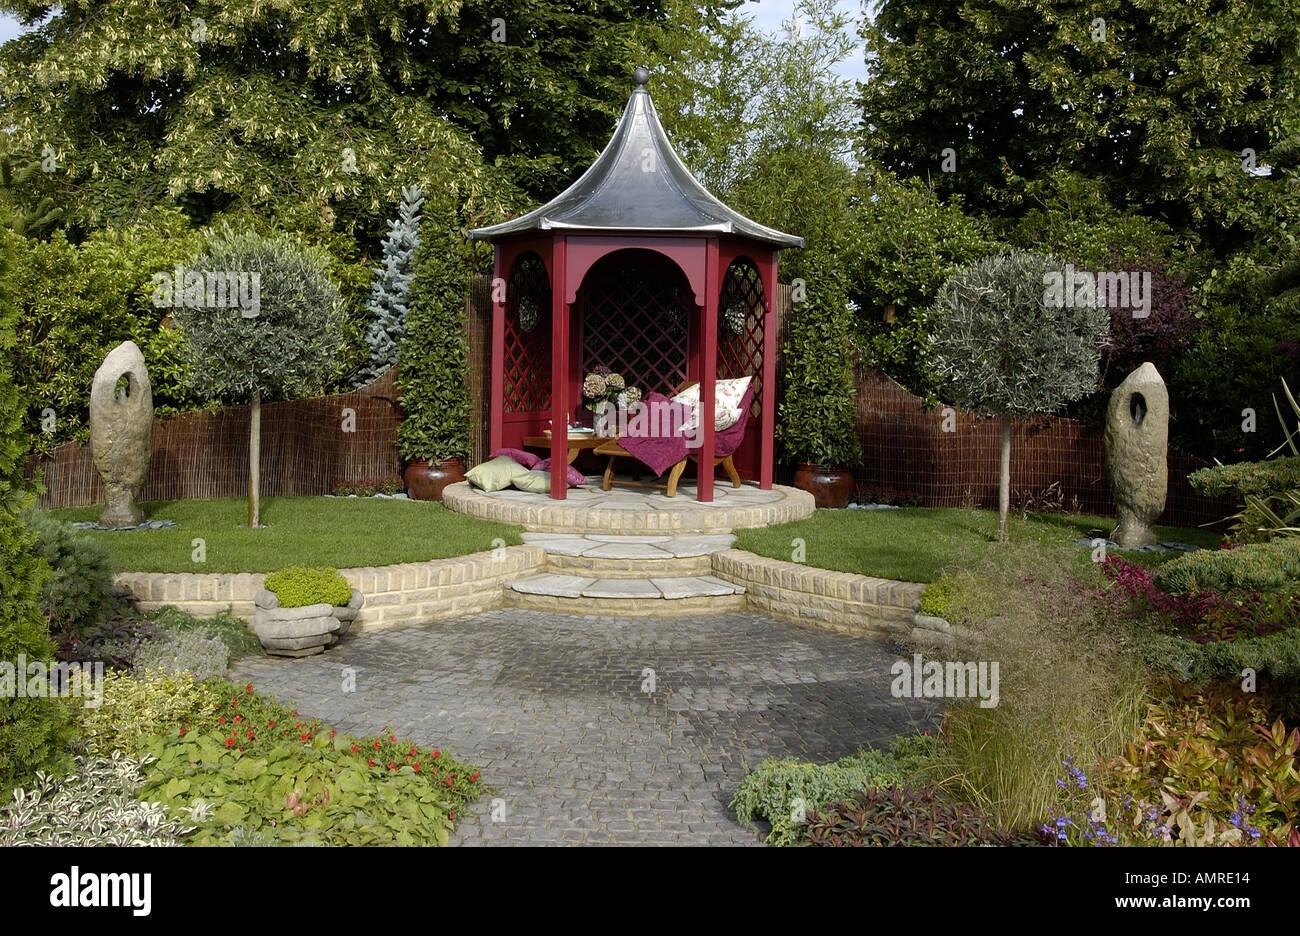 Summerhouse on a raised paved area - Stock Image